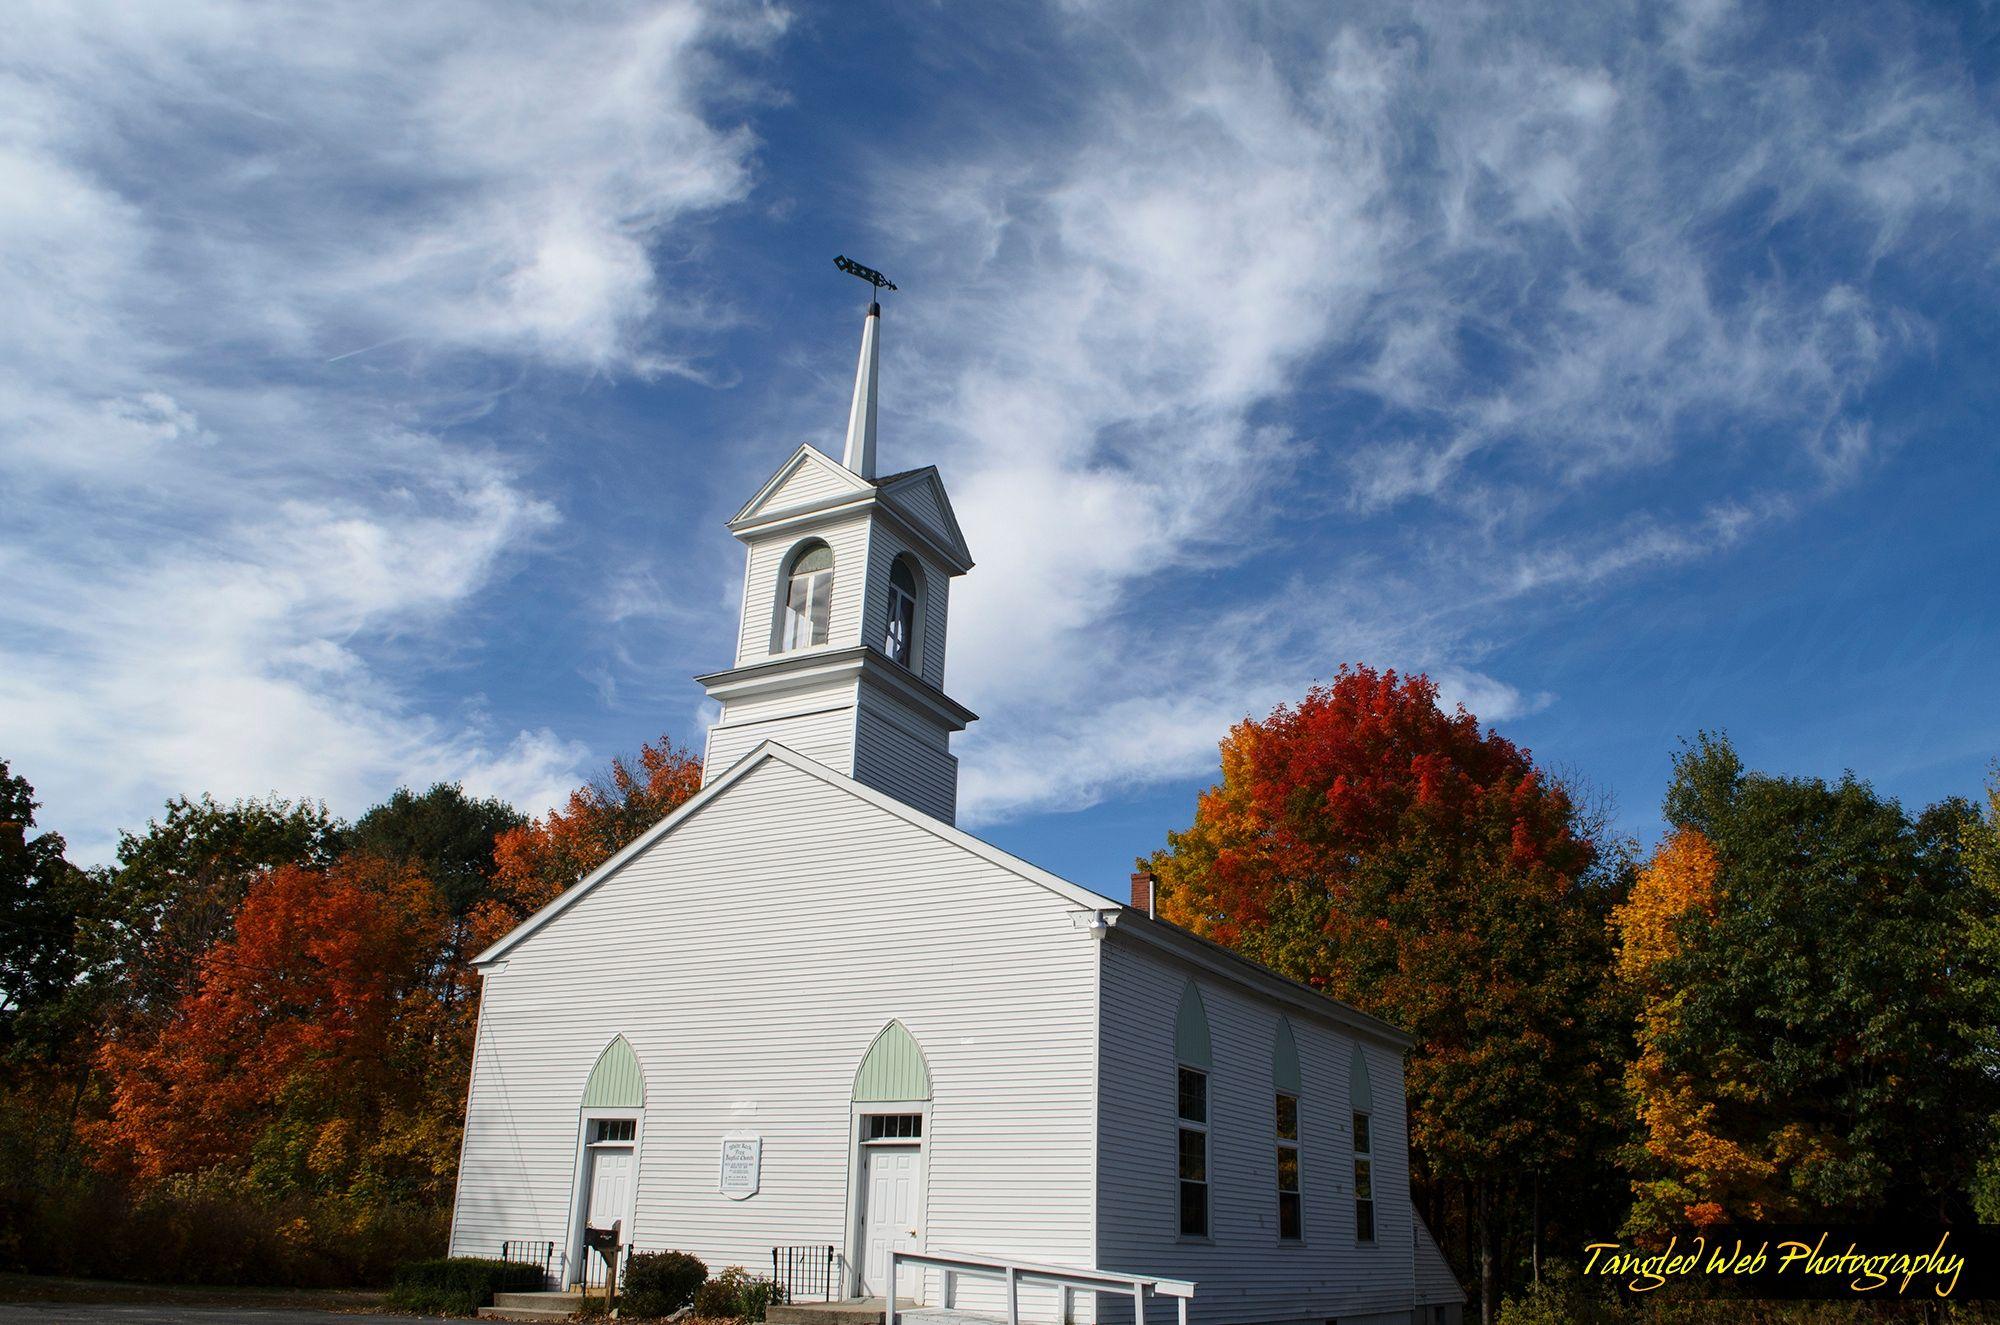 White Rock Church White Rock Church Church, Baptist